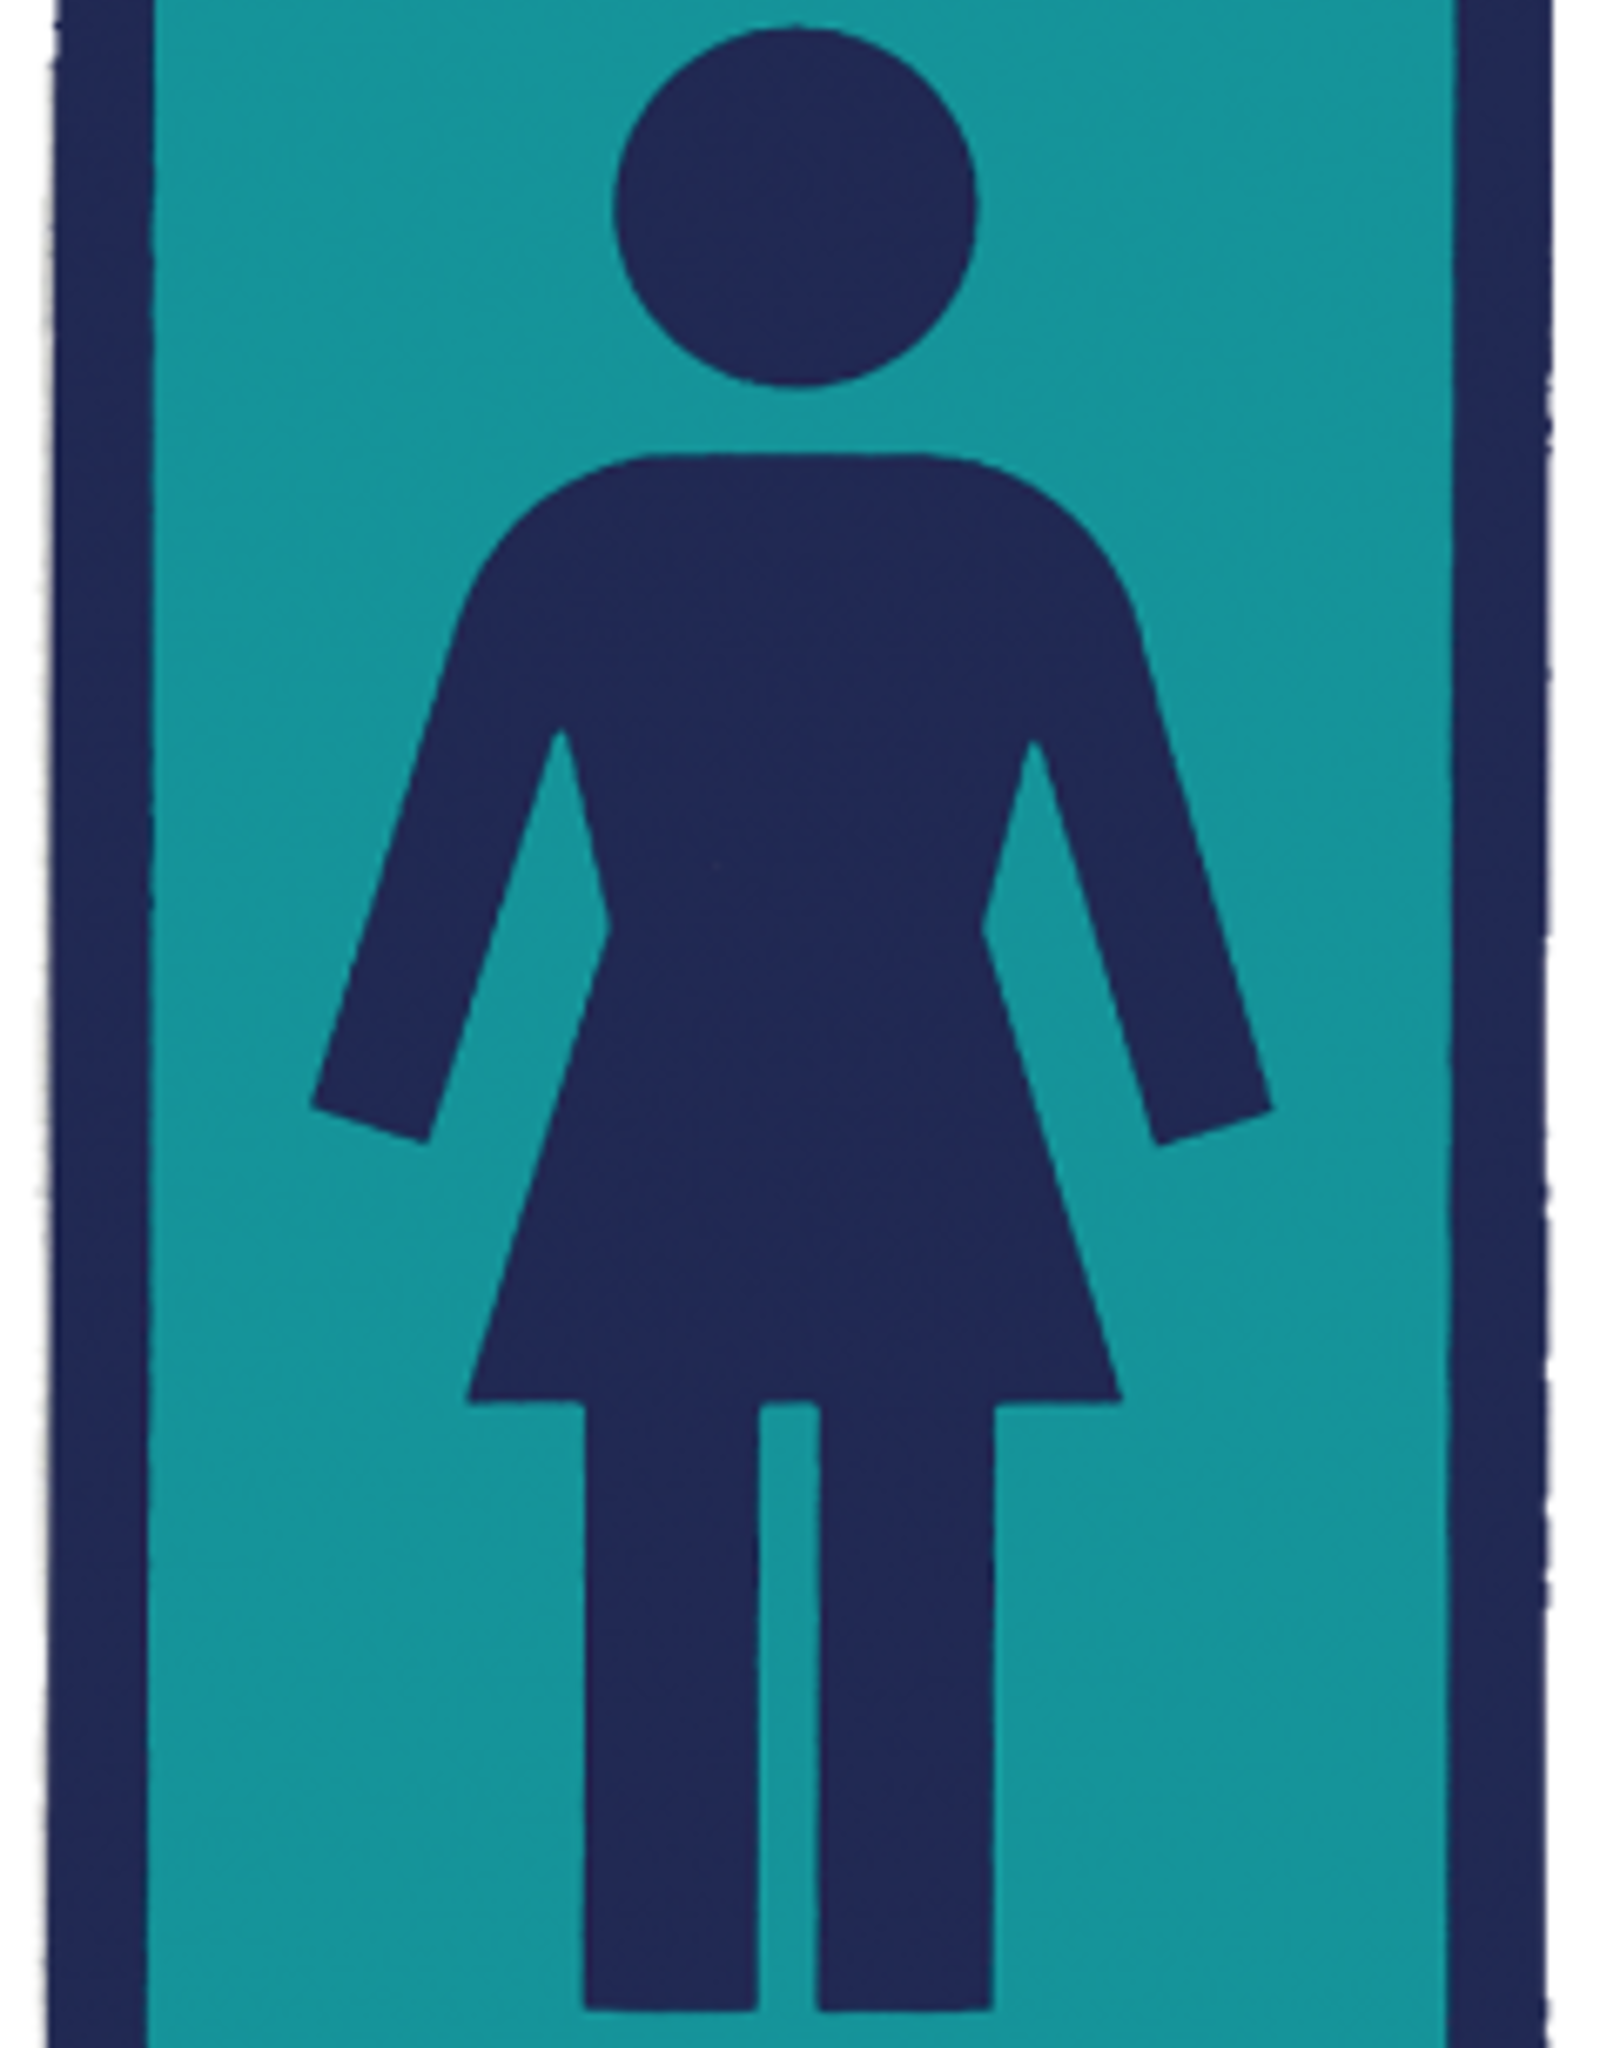 GIRL GIRL SKATEBOARD COMPANY STICKER ASSORTED COLORS